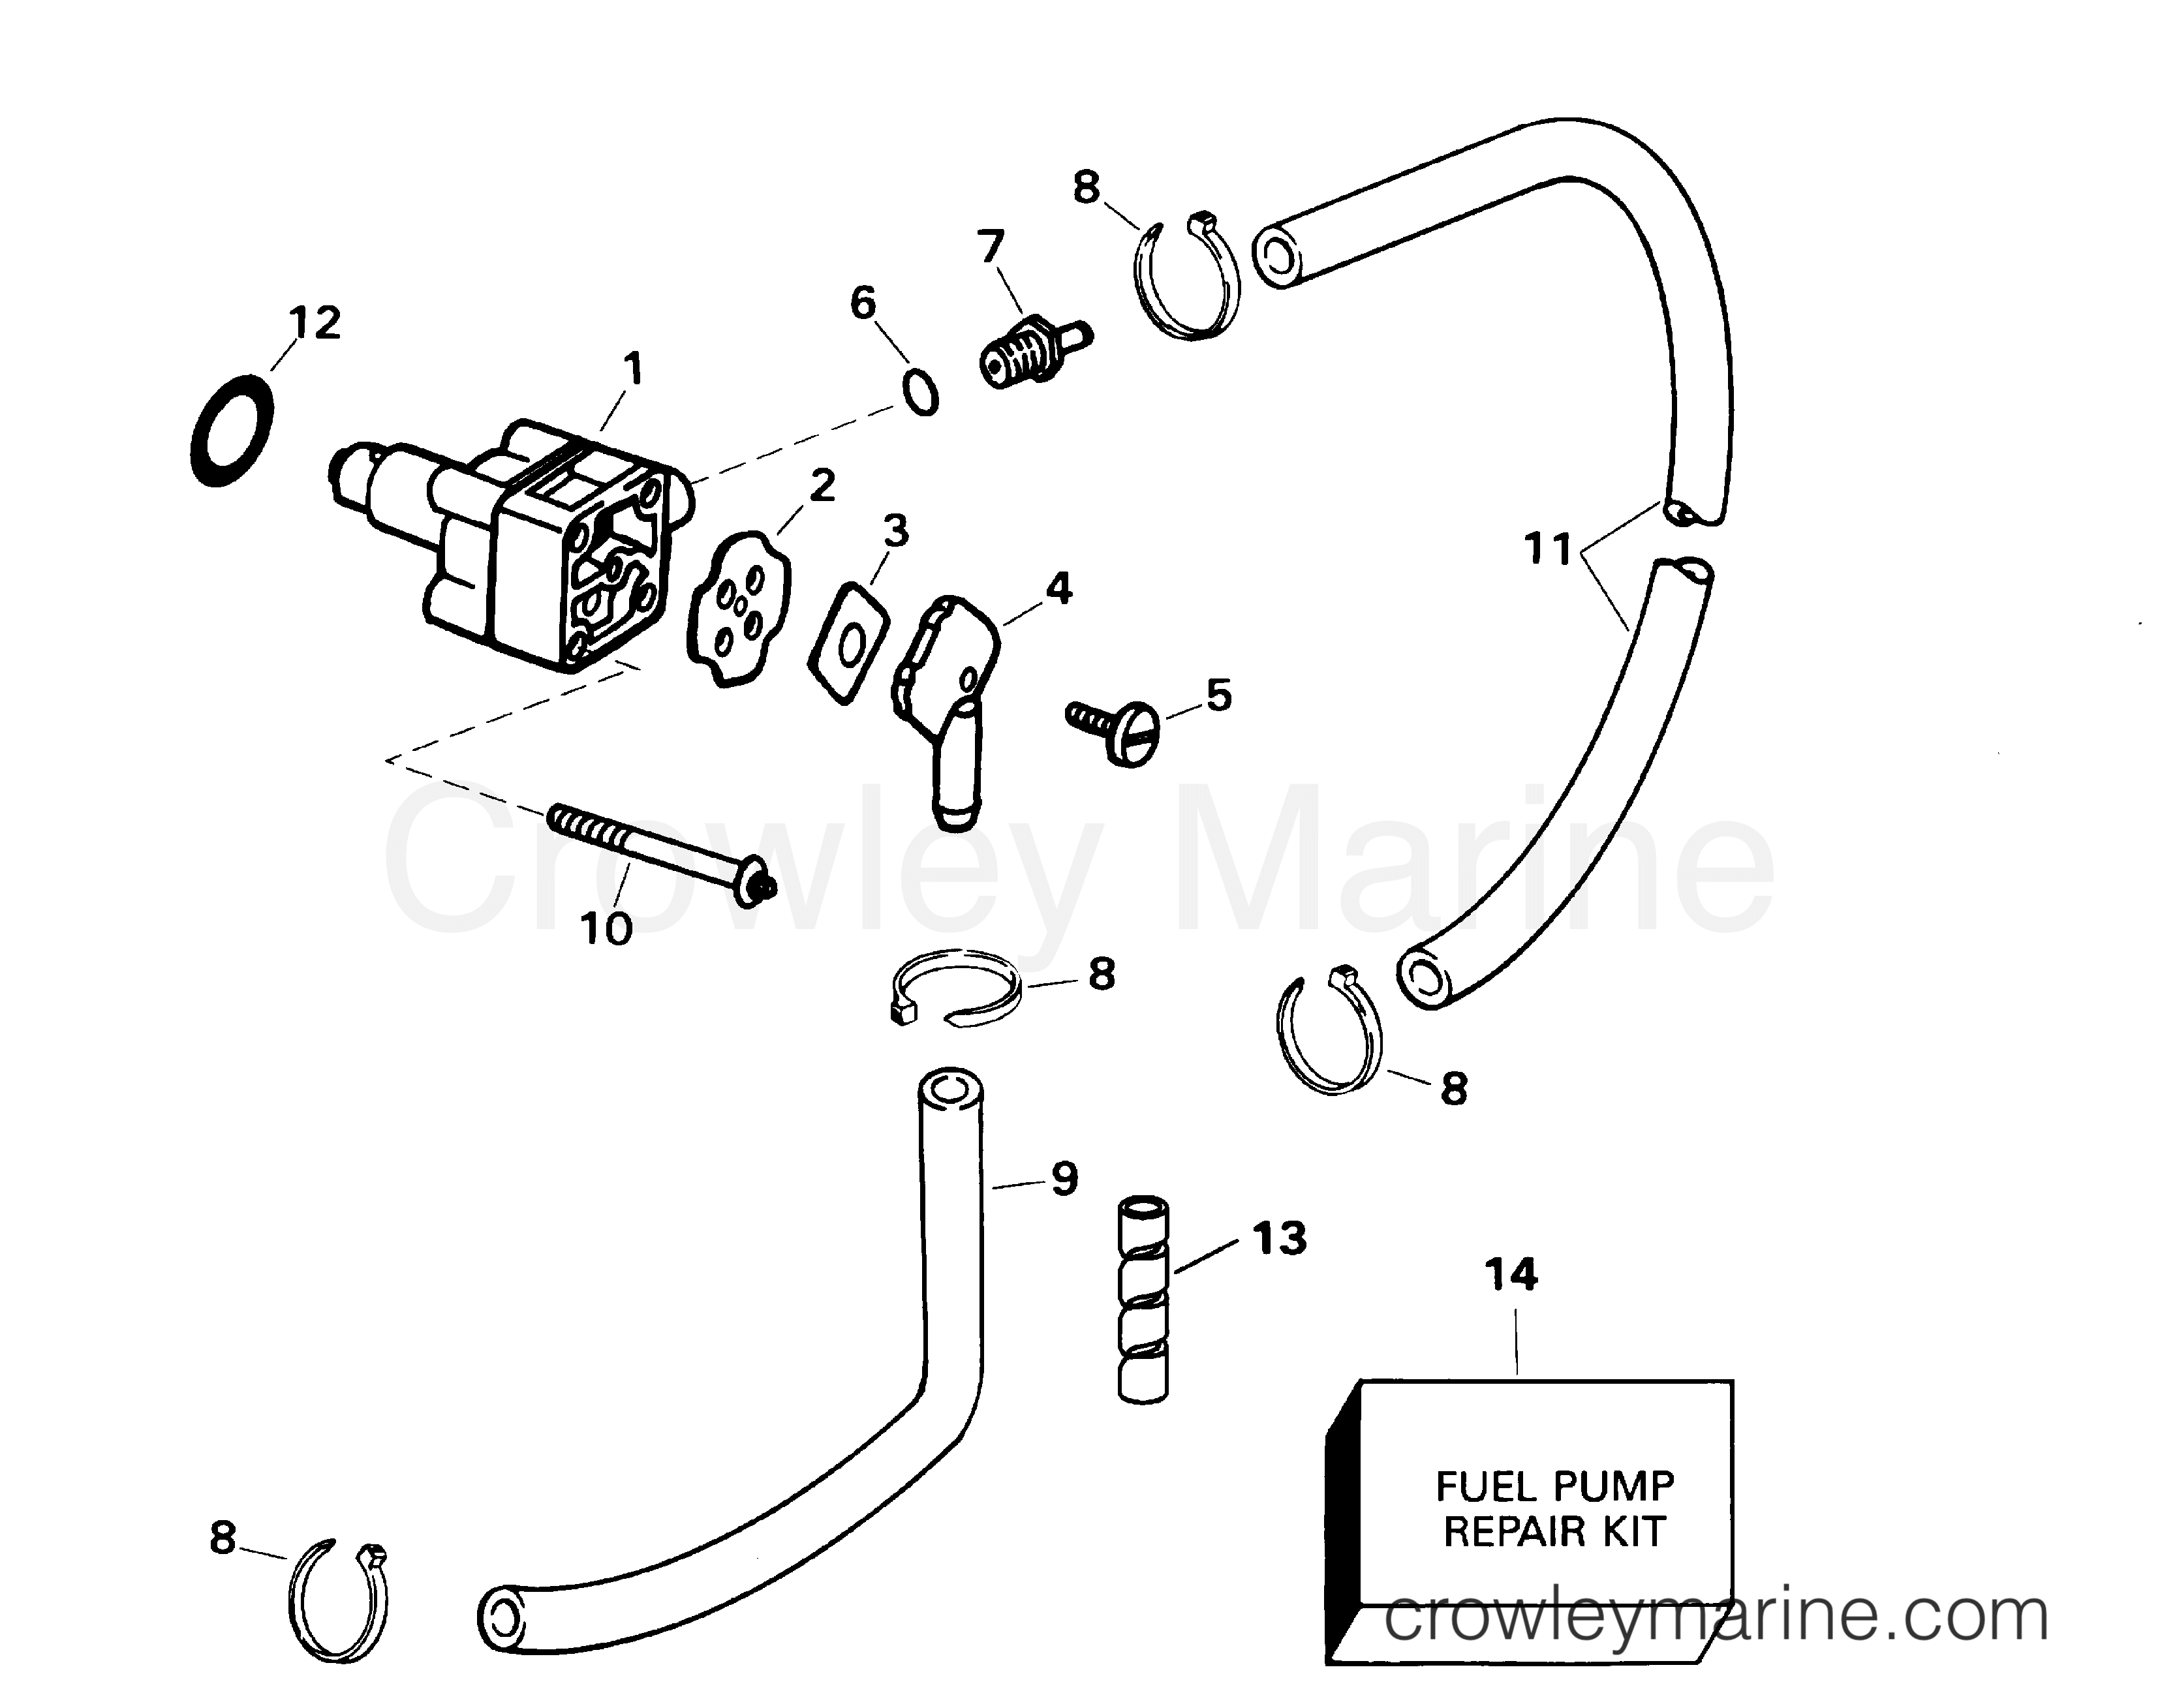 2001 Evinrude Outboards 10 - E10EL4SID FUEL PUMP section